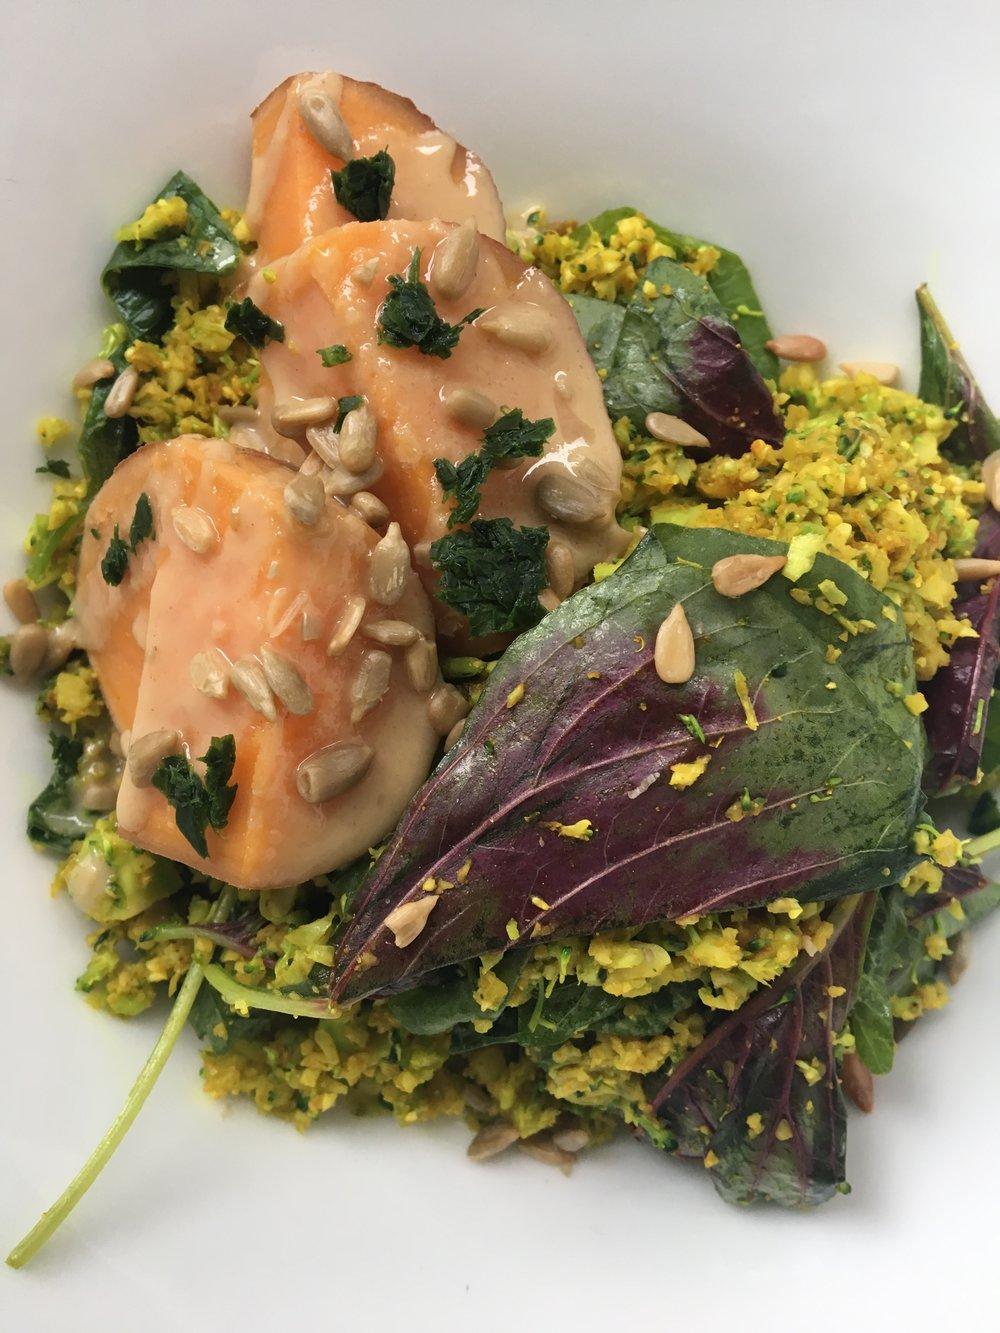 Mixed Broccoli + Cauliflower Rice w/ Purple Callaloo / Sweet Potato / Tahini + Turmeric